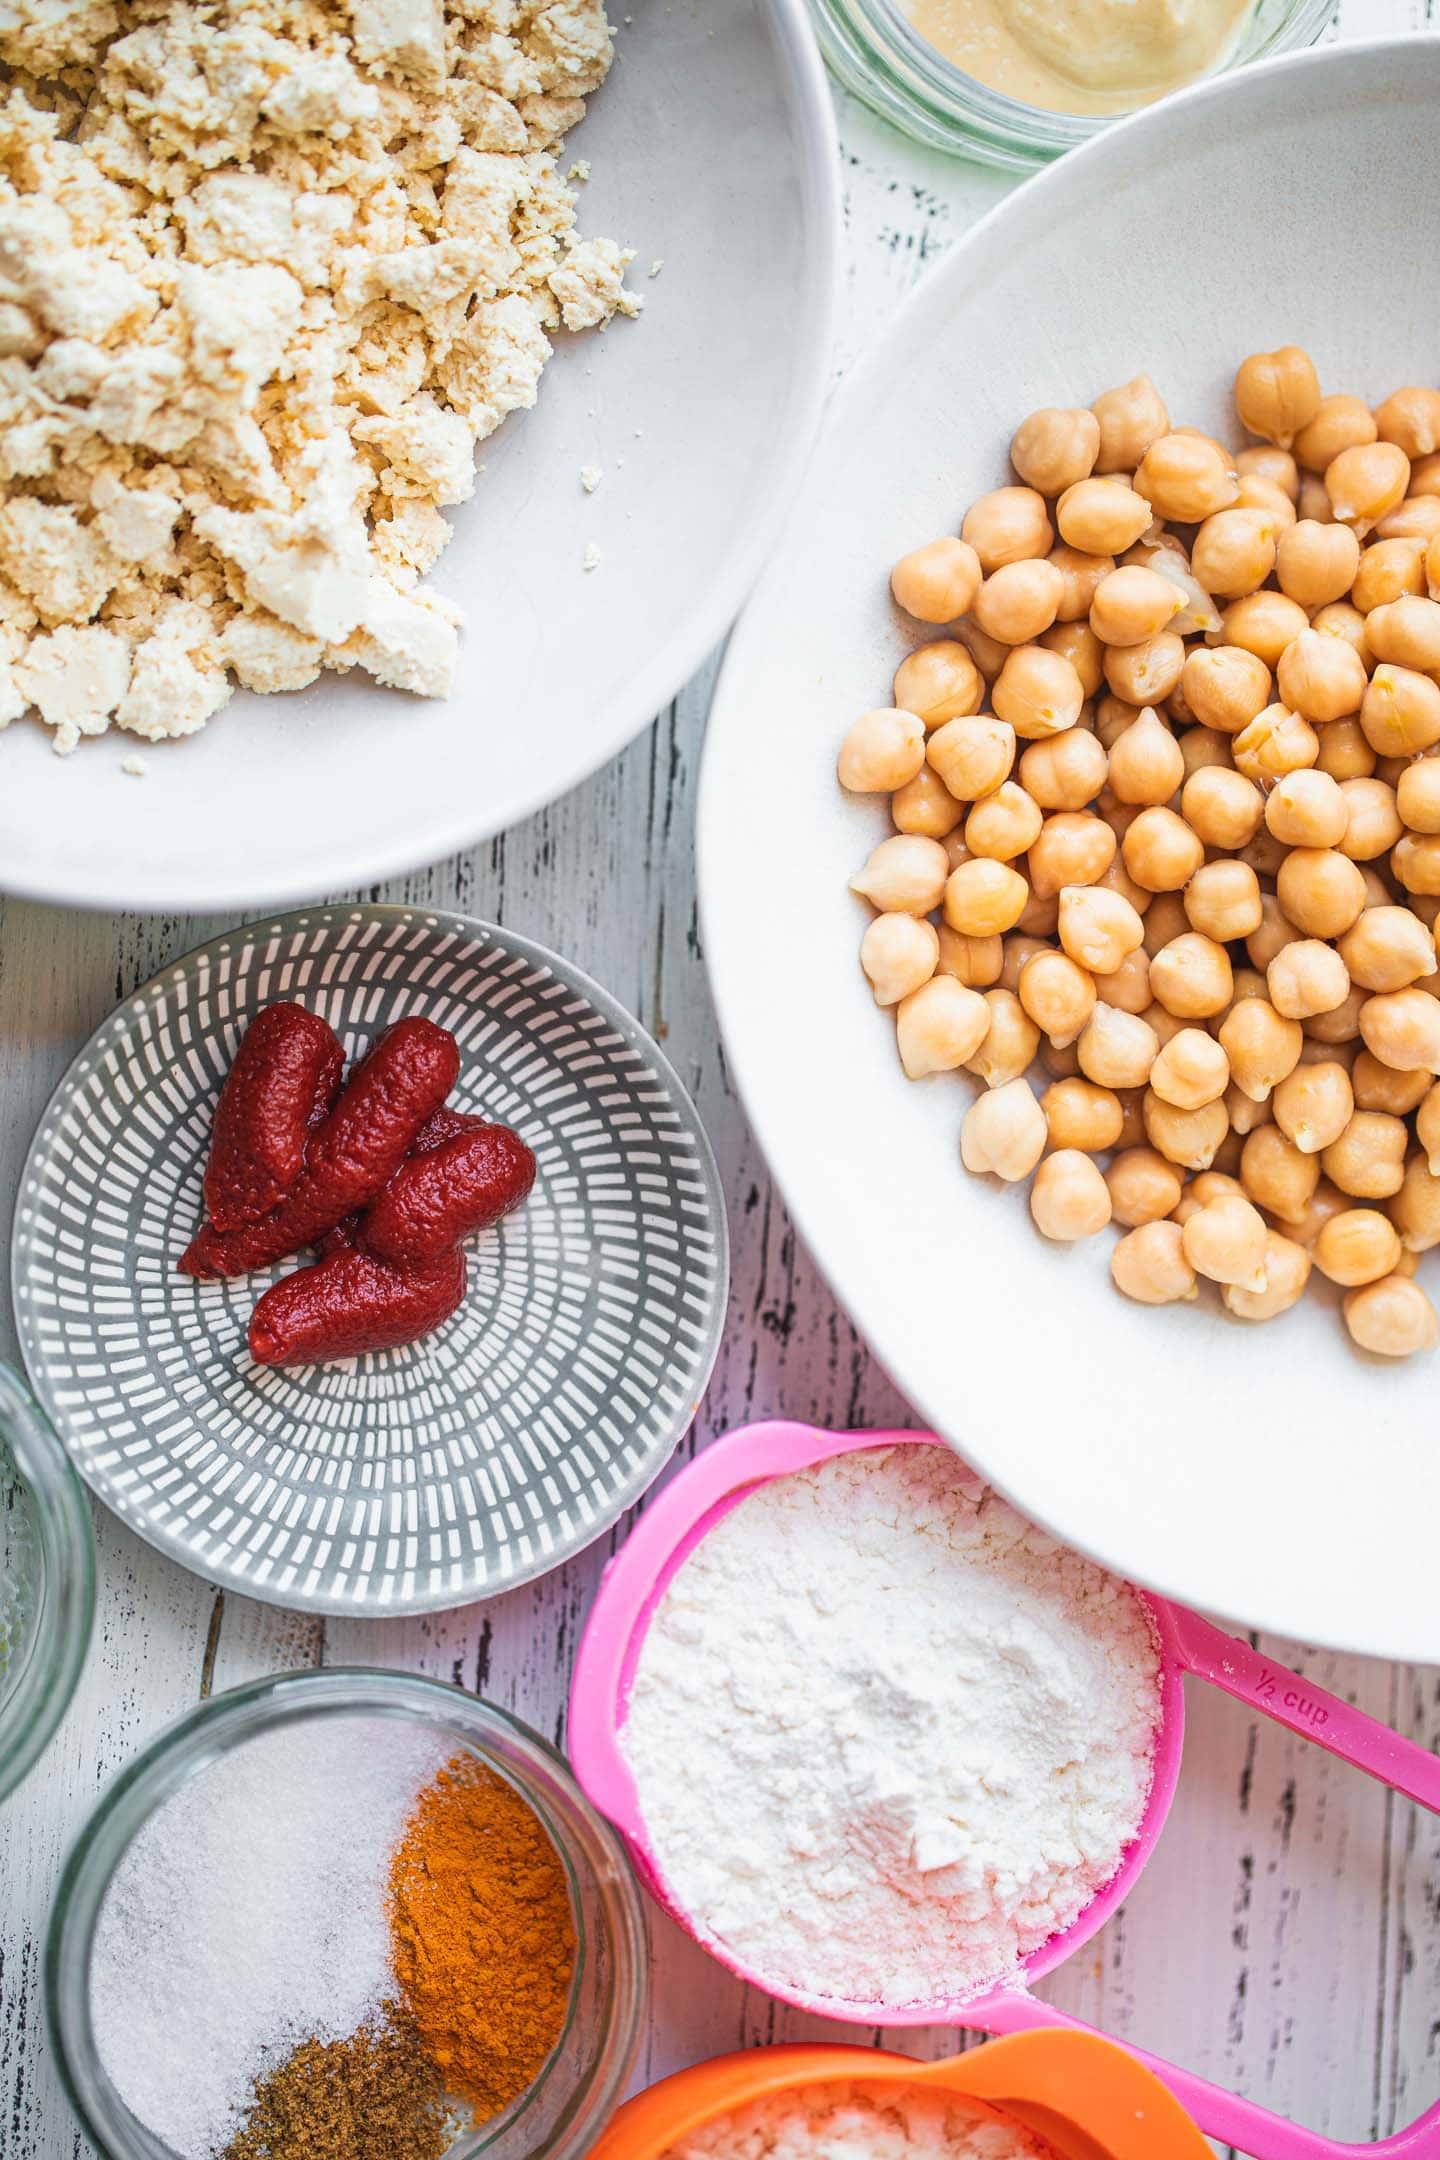 Ingredients for vegan chicken nuggets